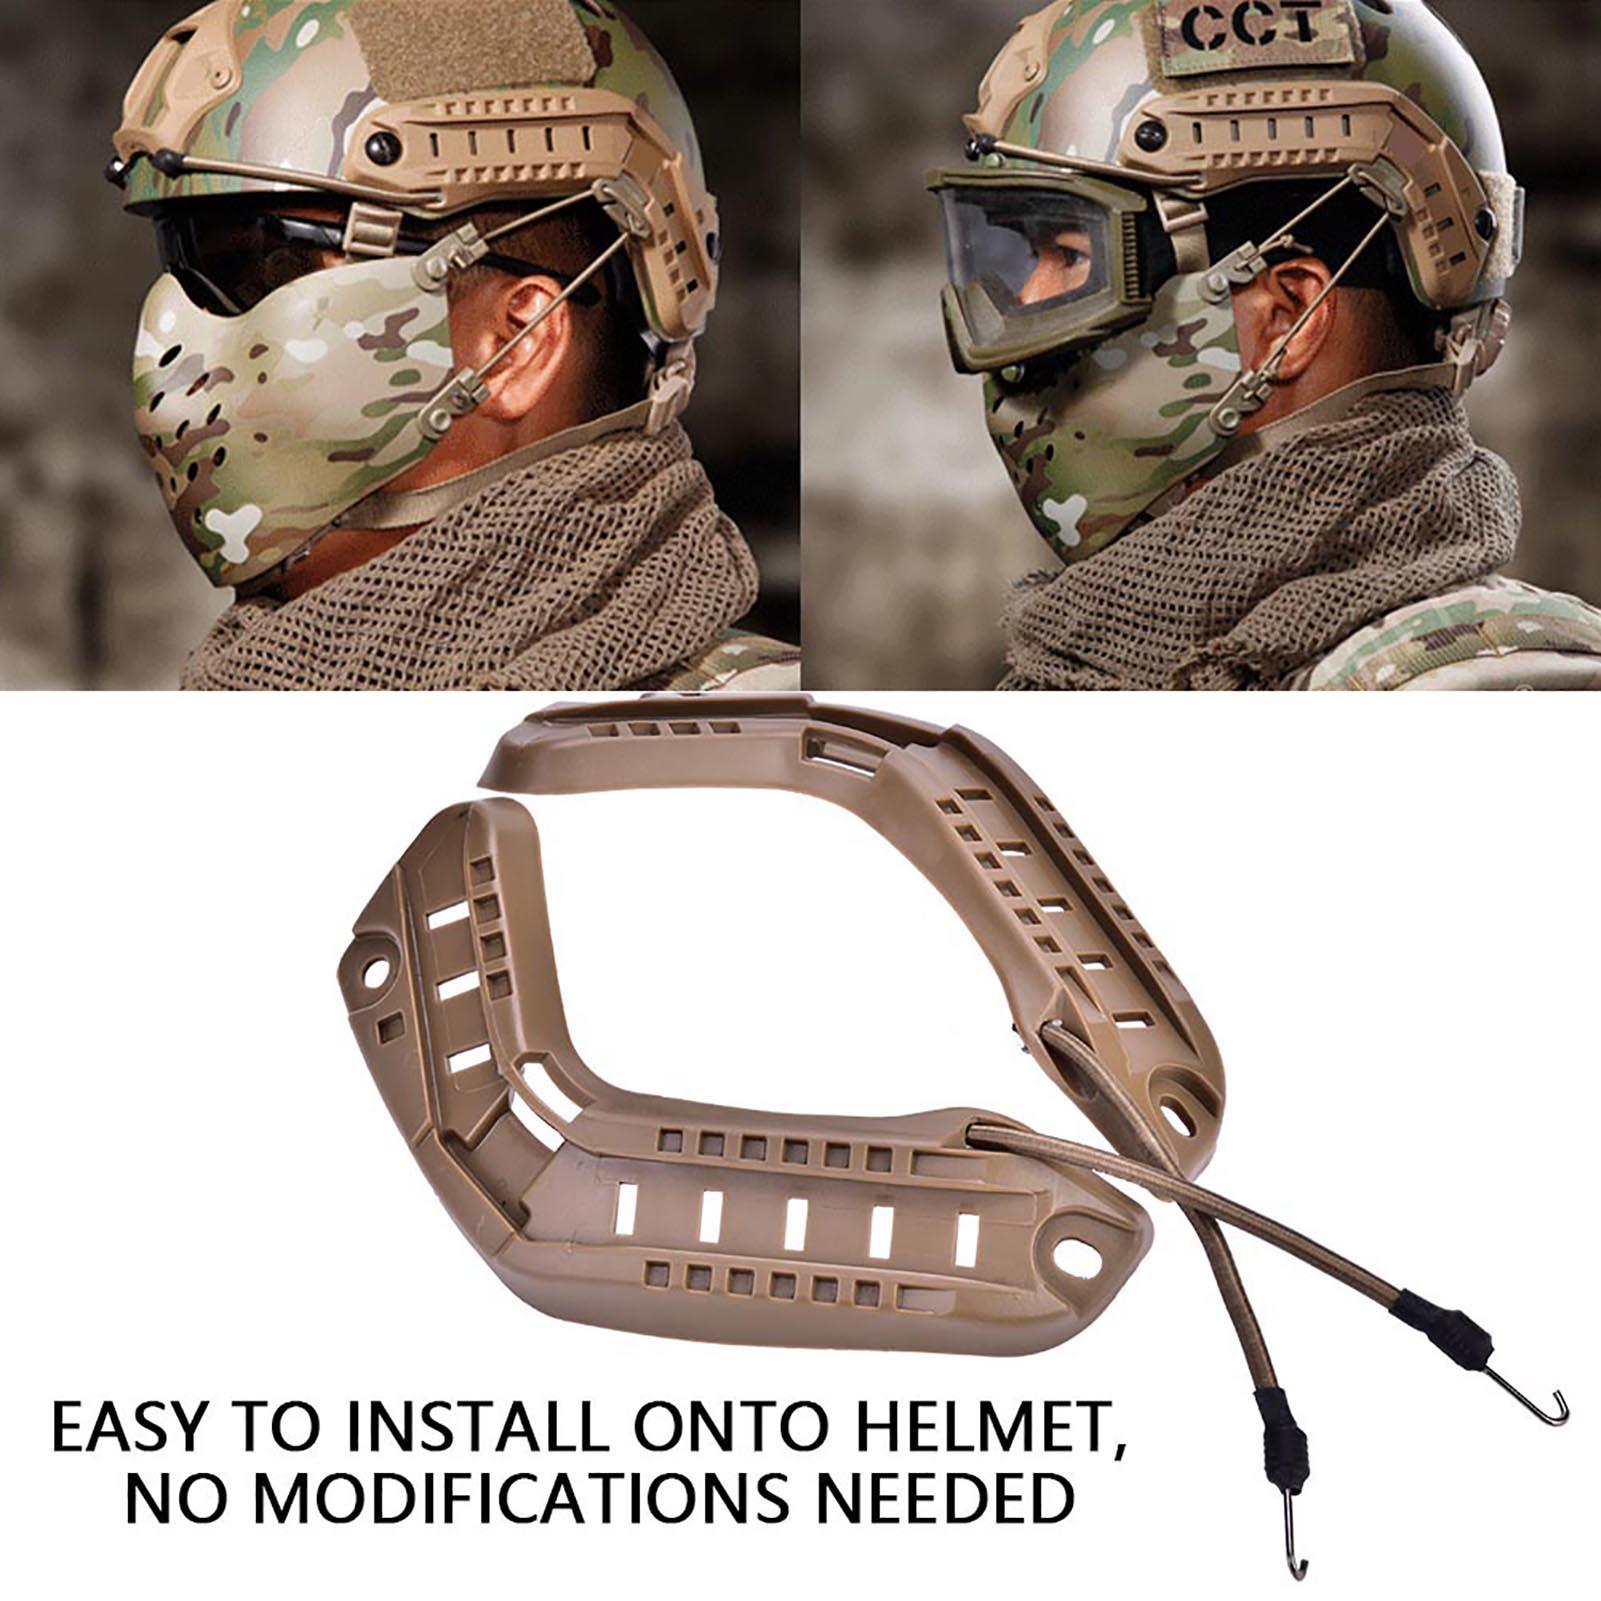 1Pair-Helmet-Side-Rails-for-Flashlight-Camera-Attachments-W-Mounting-Screws-Kit thumbnail 21